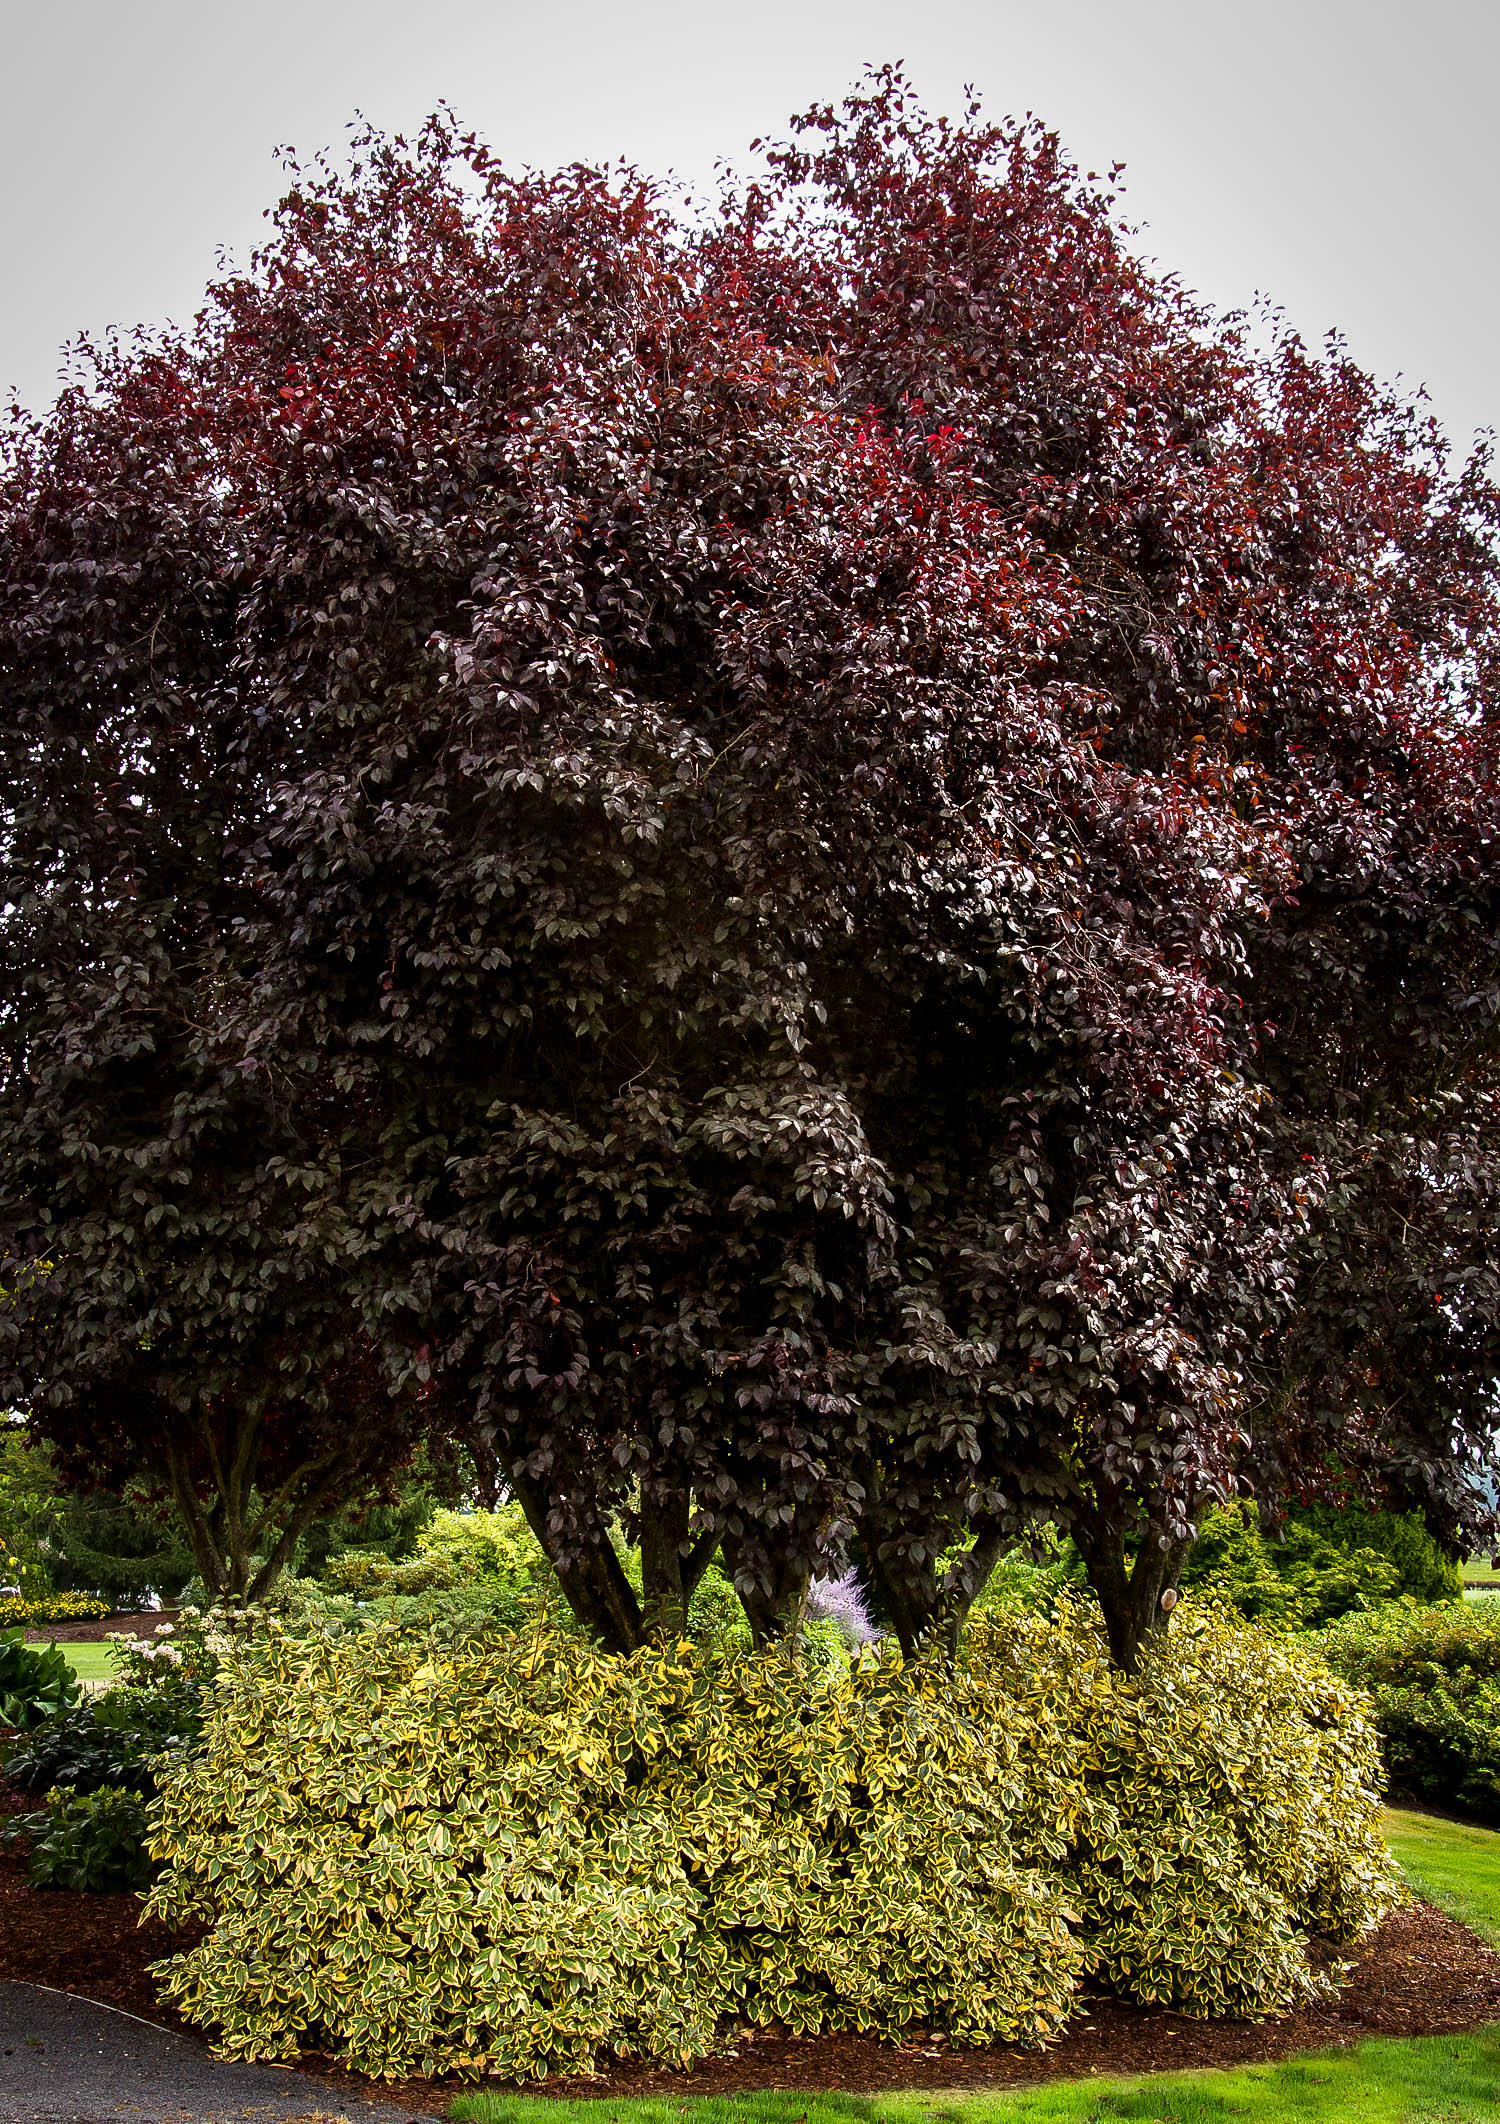 Thundercloud Purple Leaf Plum Trees For Sale The Tree Center